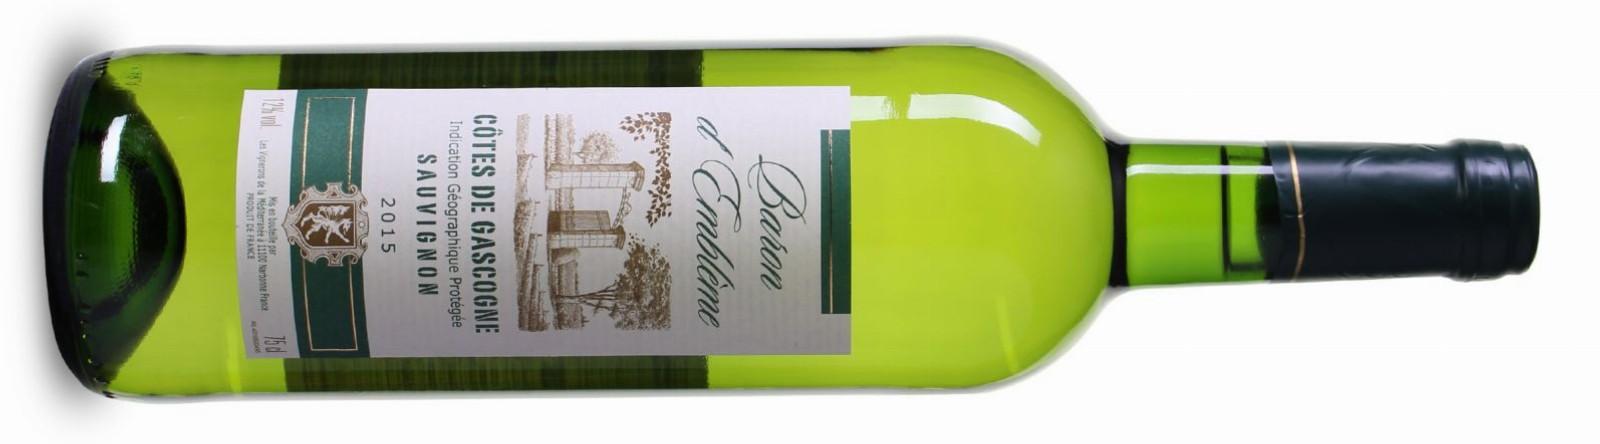 Baron d'Emblème Sauvignon Blanc 2015